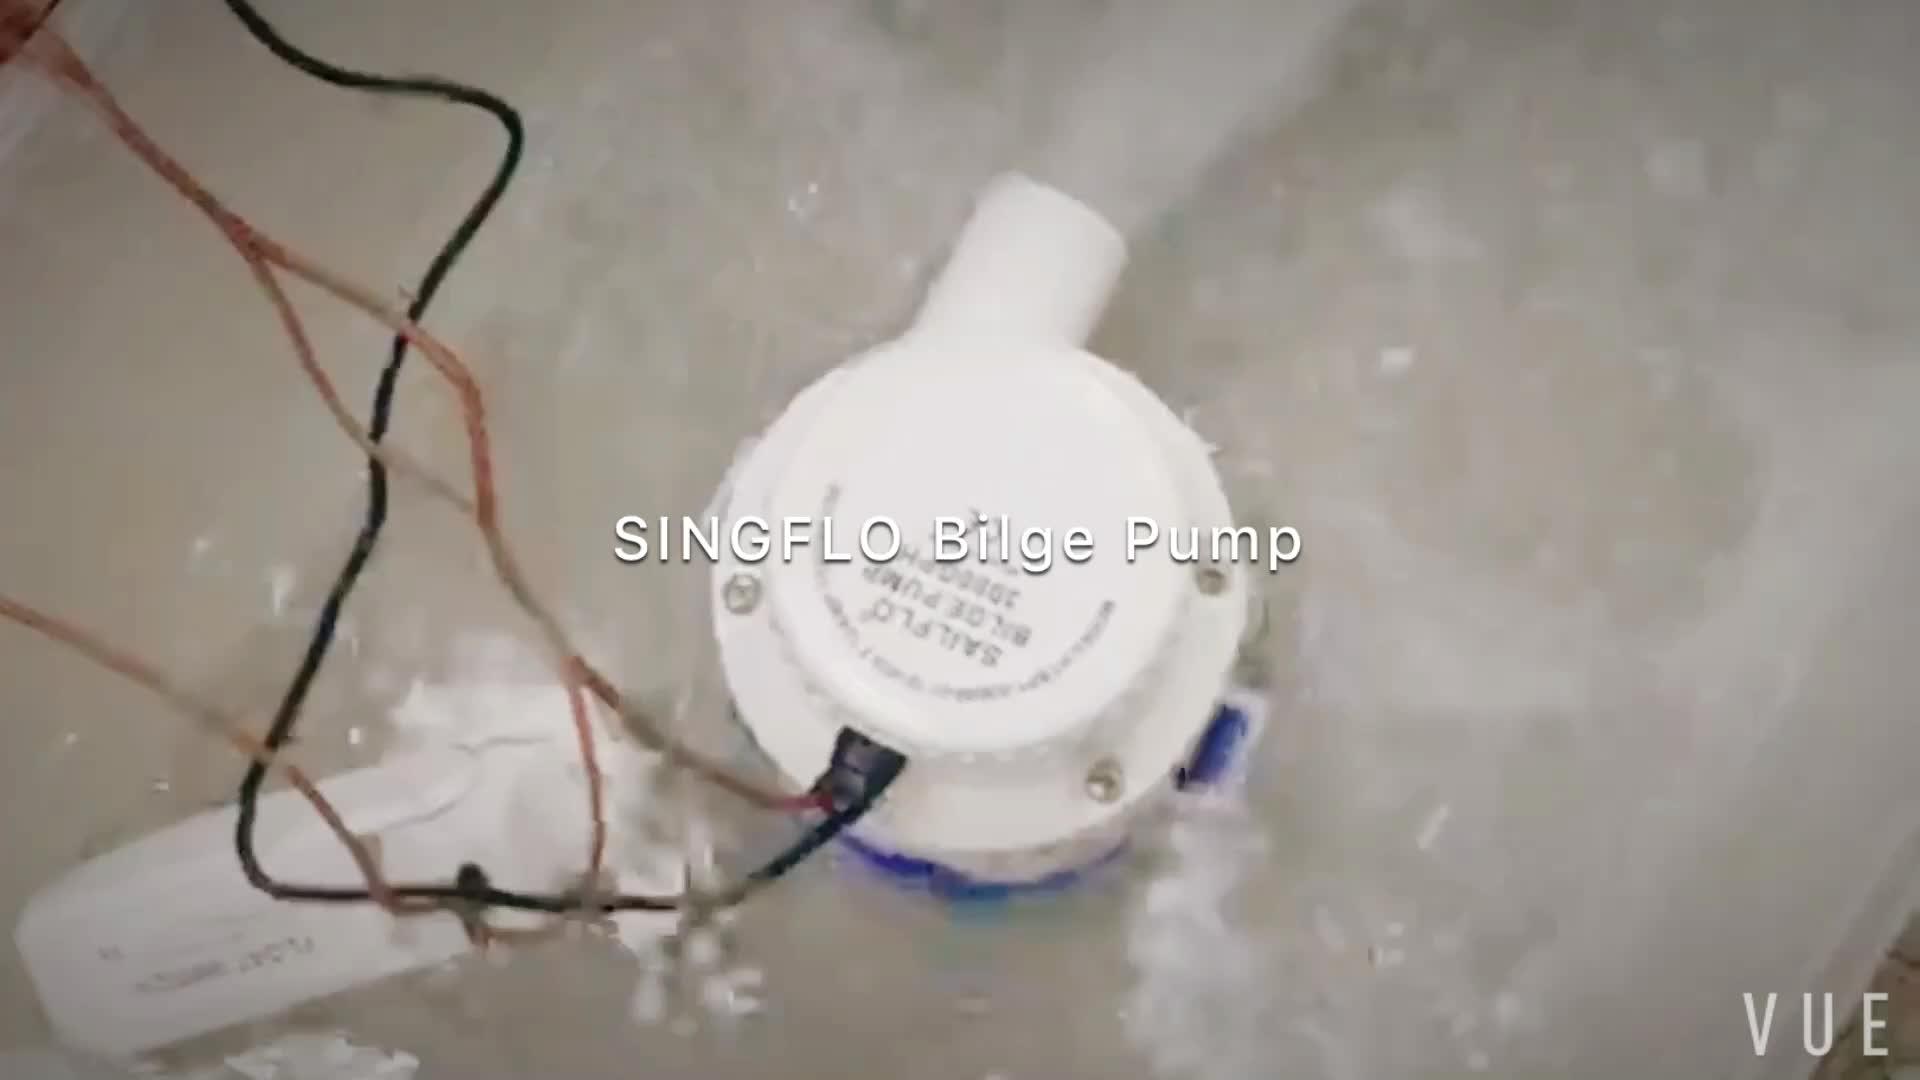 Singflo sentina interruttore/di sentina interruttore di livello/interruttore galleggiante pompa di sentina